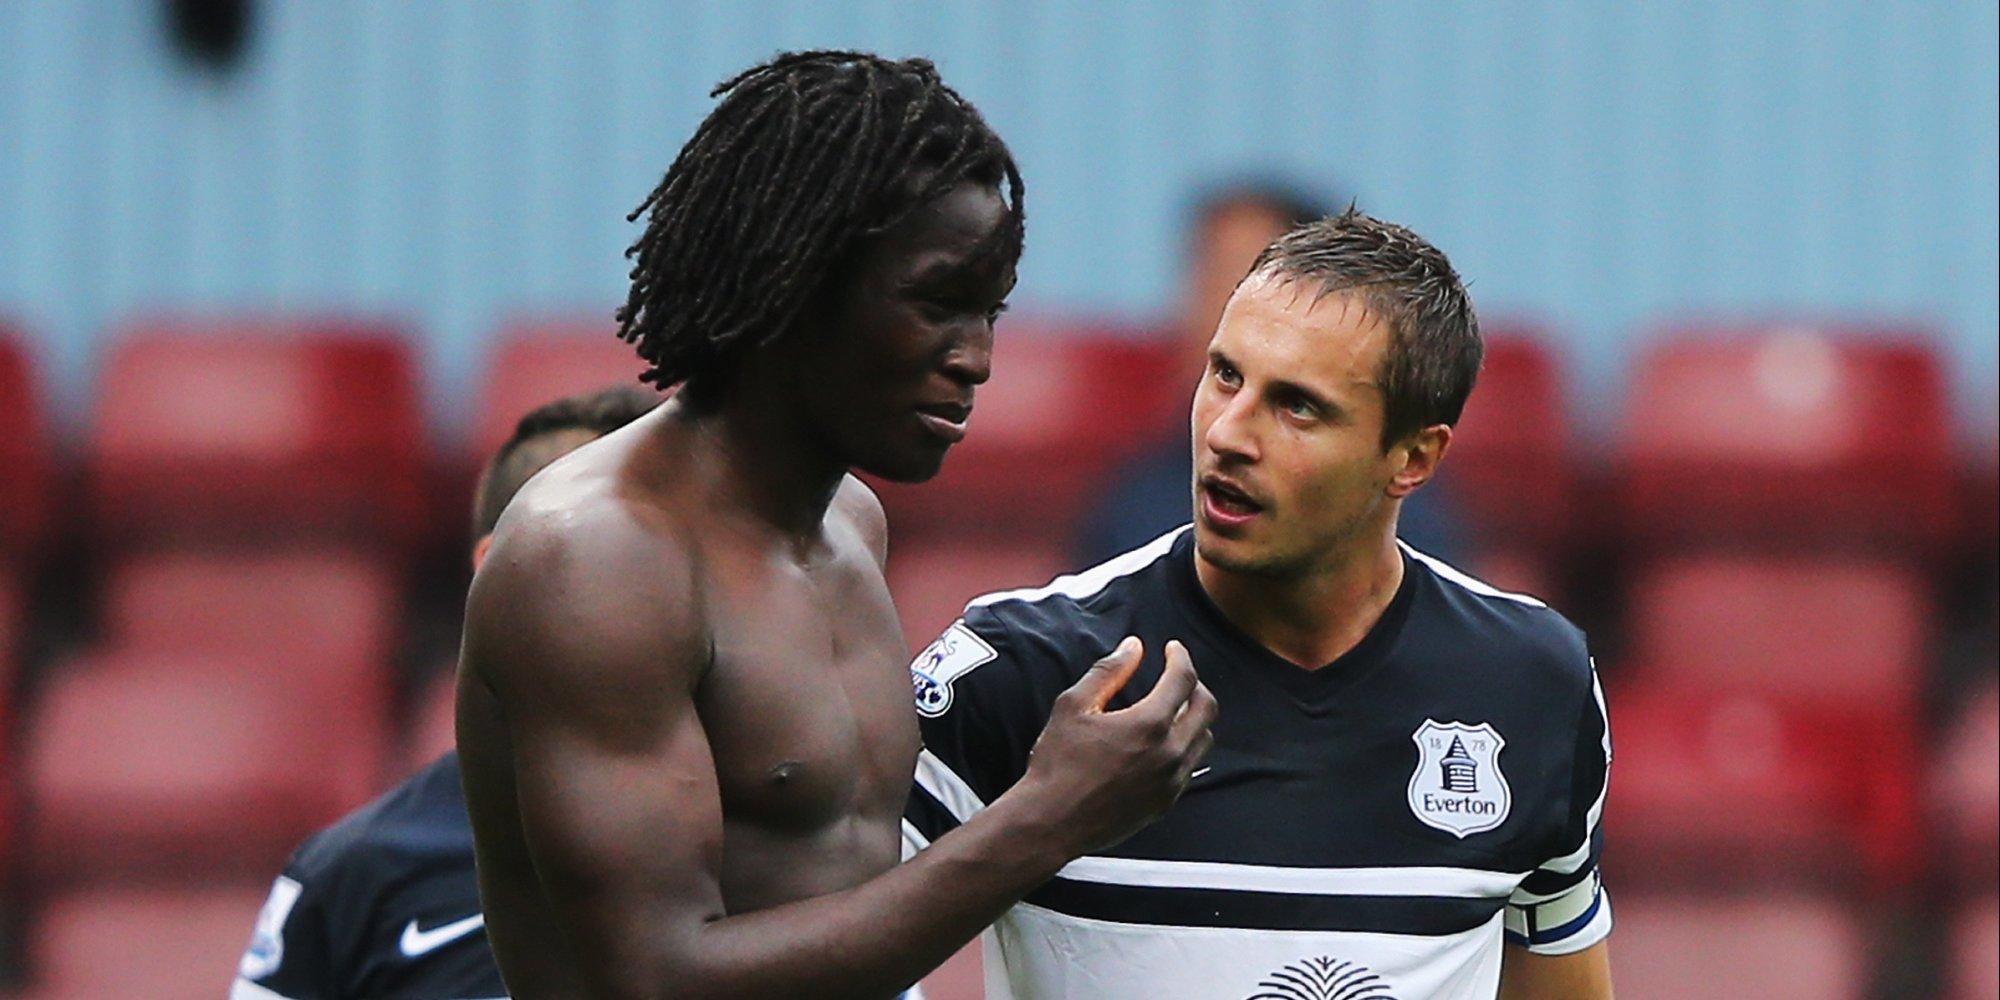 Does Romelu Lukaku s future lie at Everton Soccer News